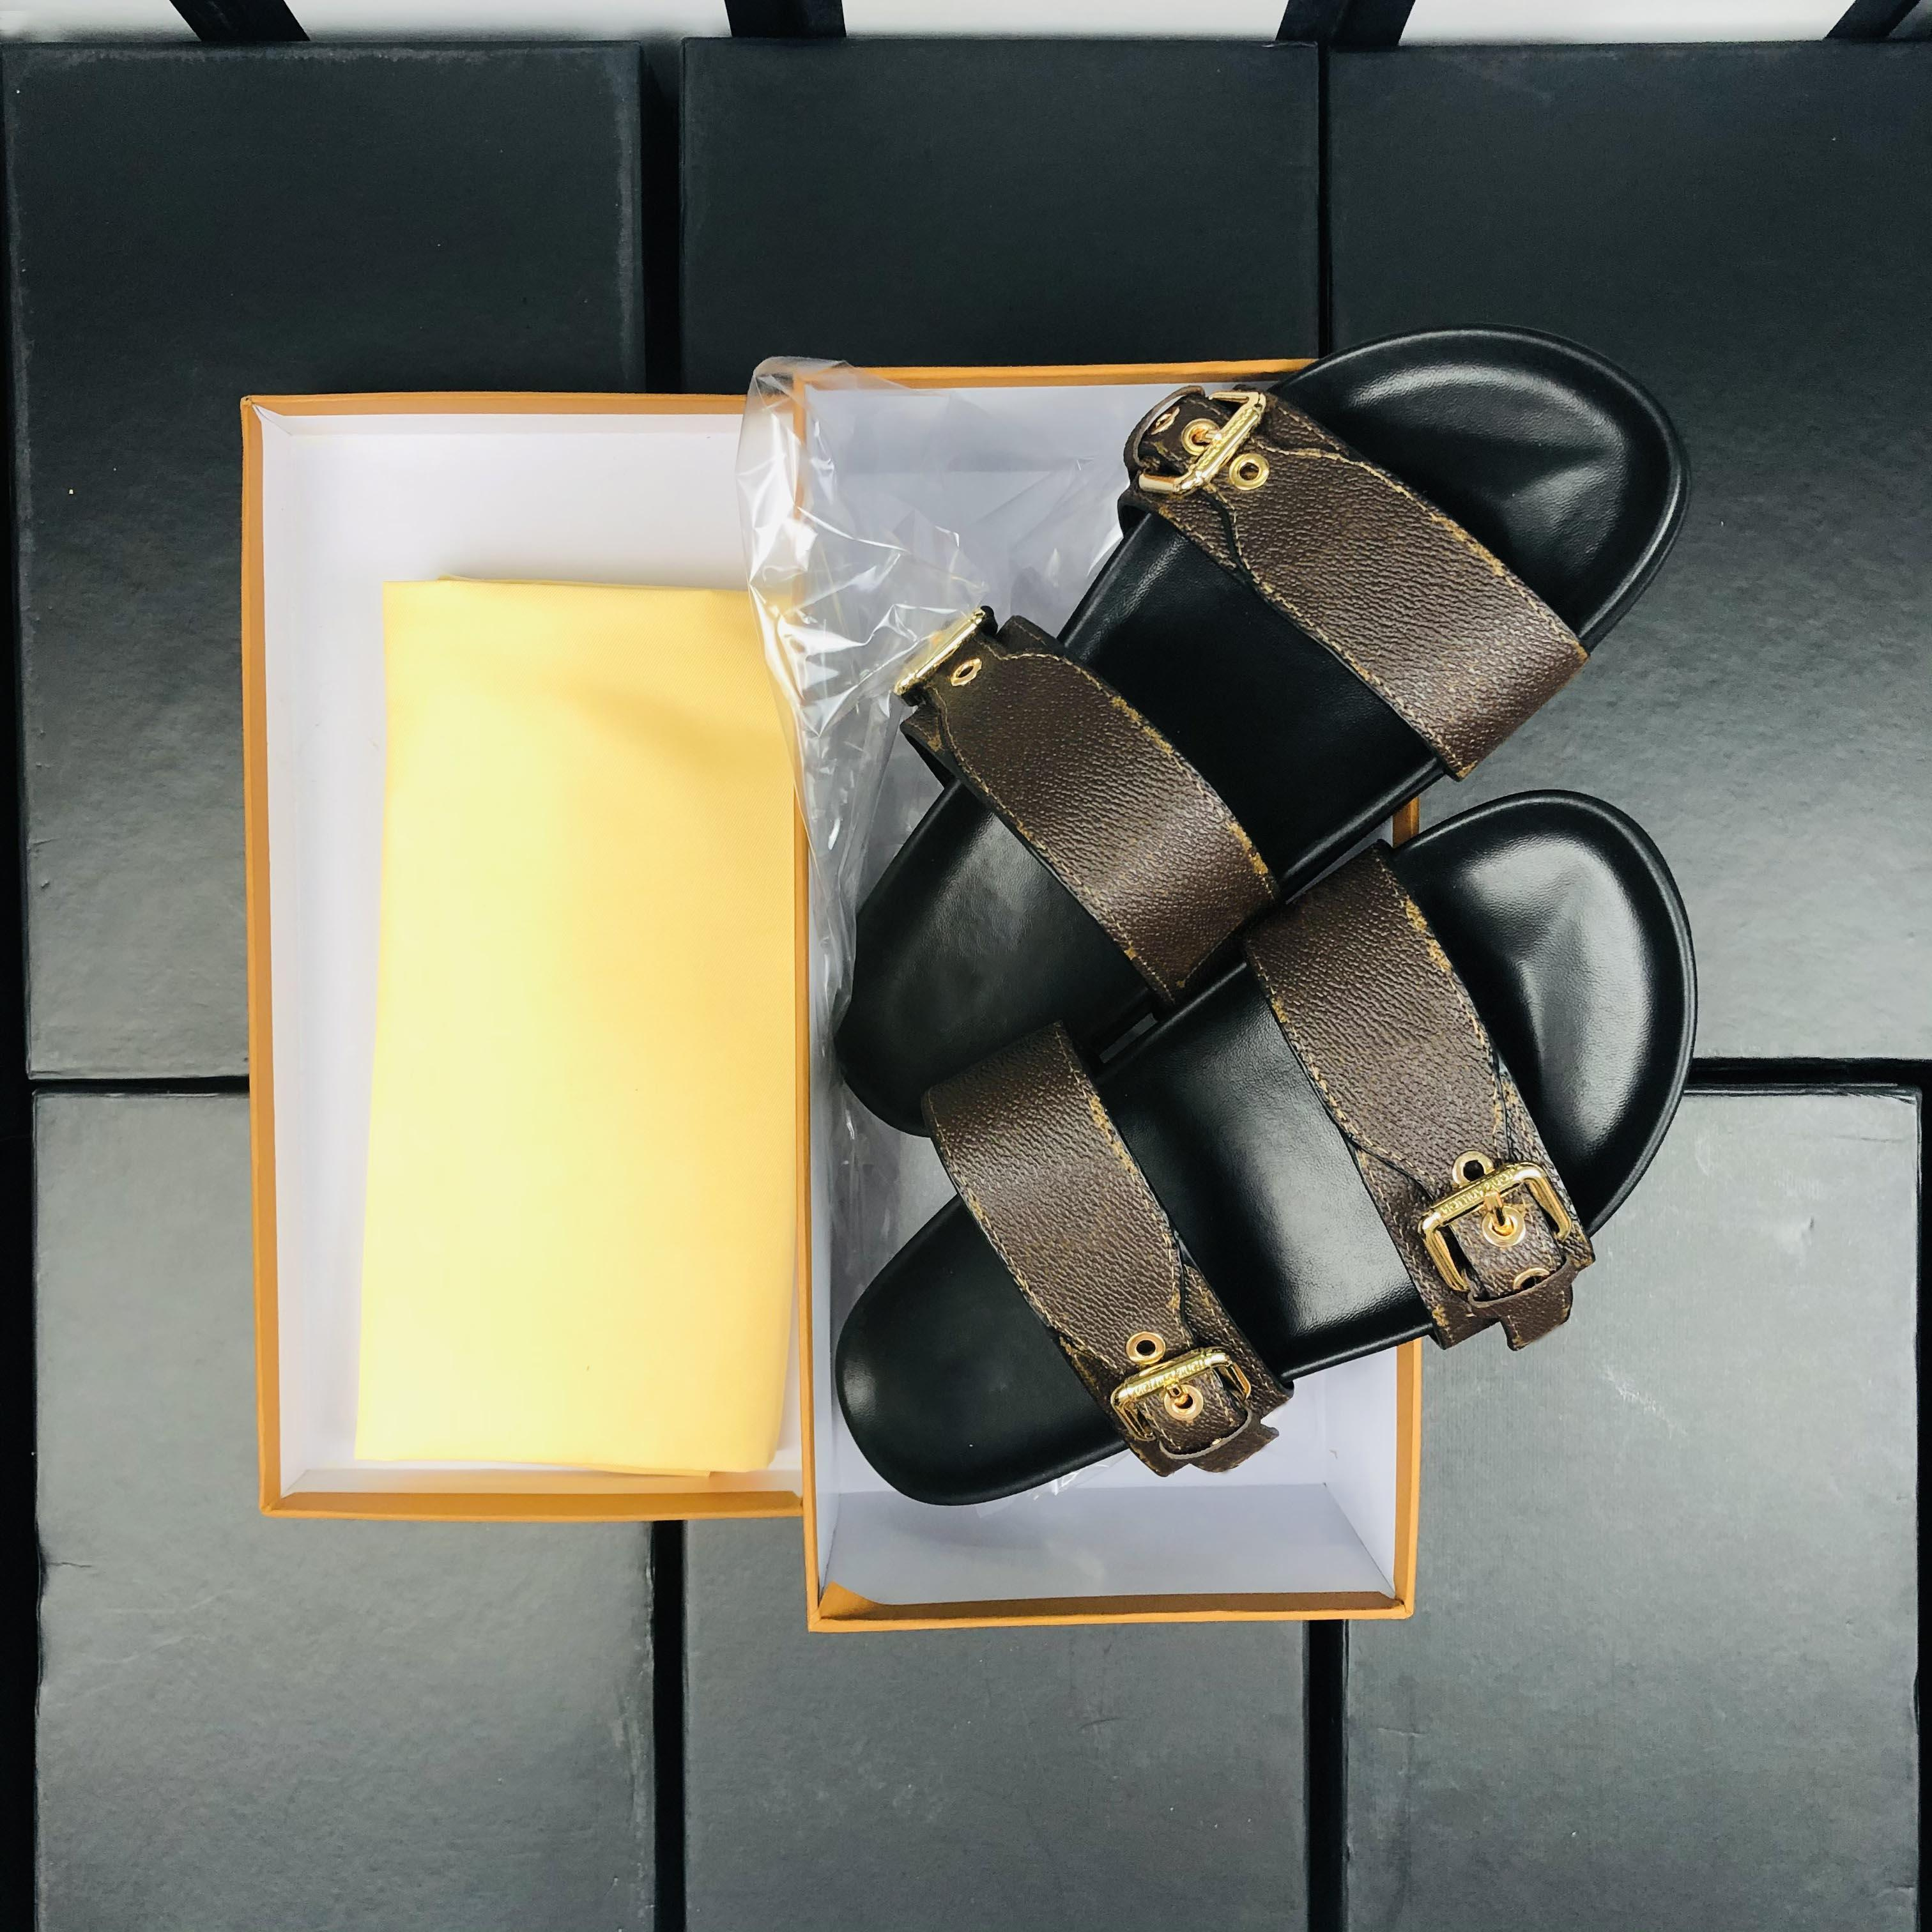 Donne Summer Pytchers Slide Bom Dia piatta mula piatto 1A3R5M Cool Slifts Elegante senza sforzo 2 cinghie con fibbie dorate regolate Sandali logo scatola di grandi dimensioni 35-42